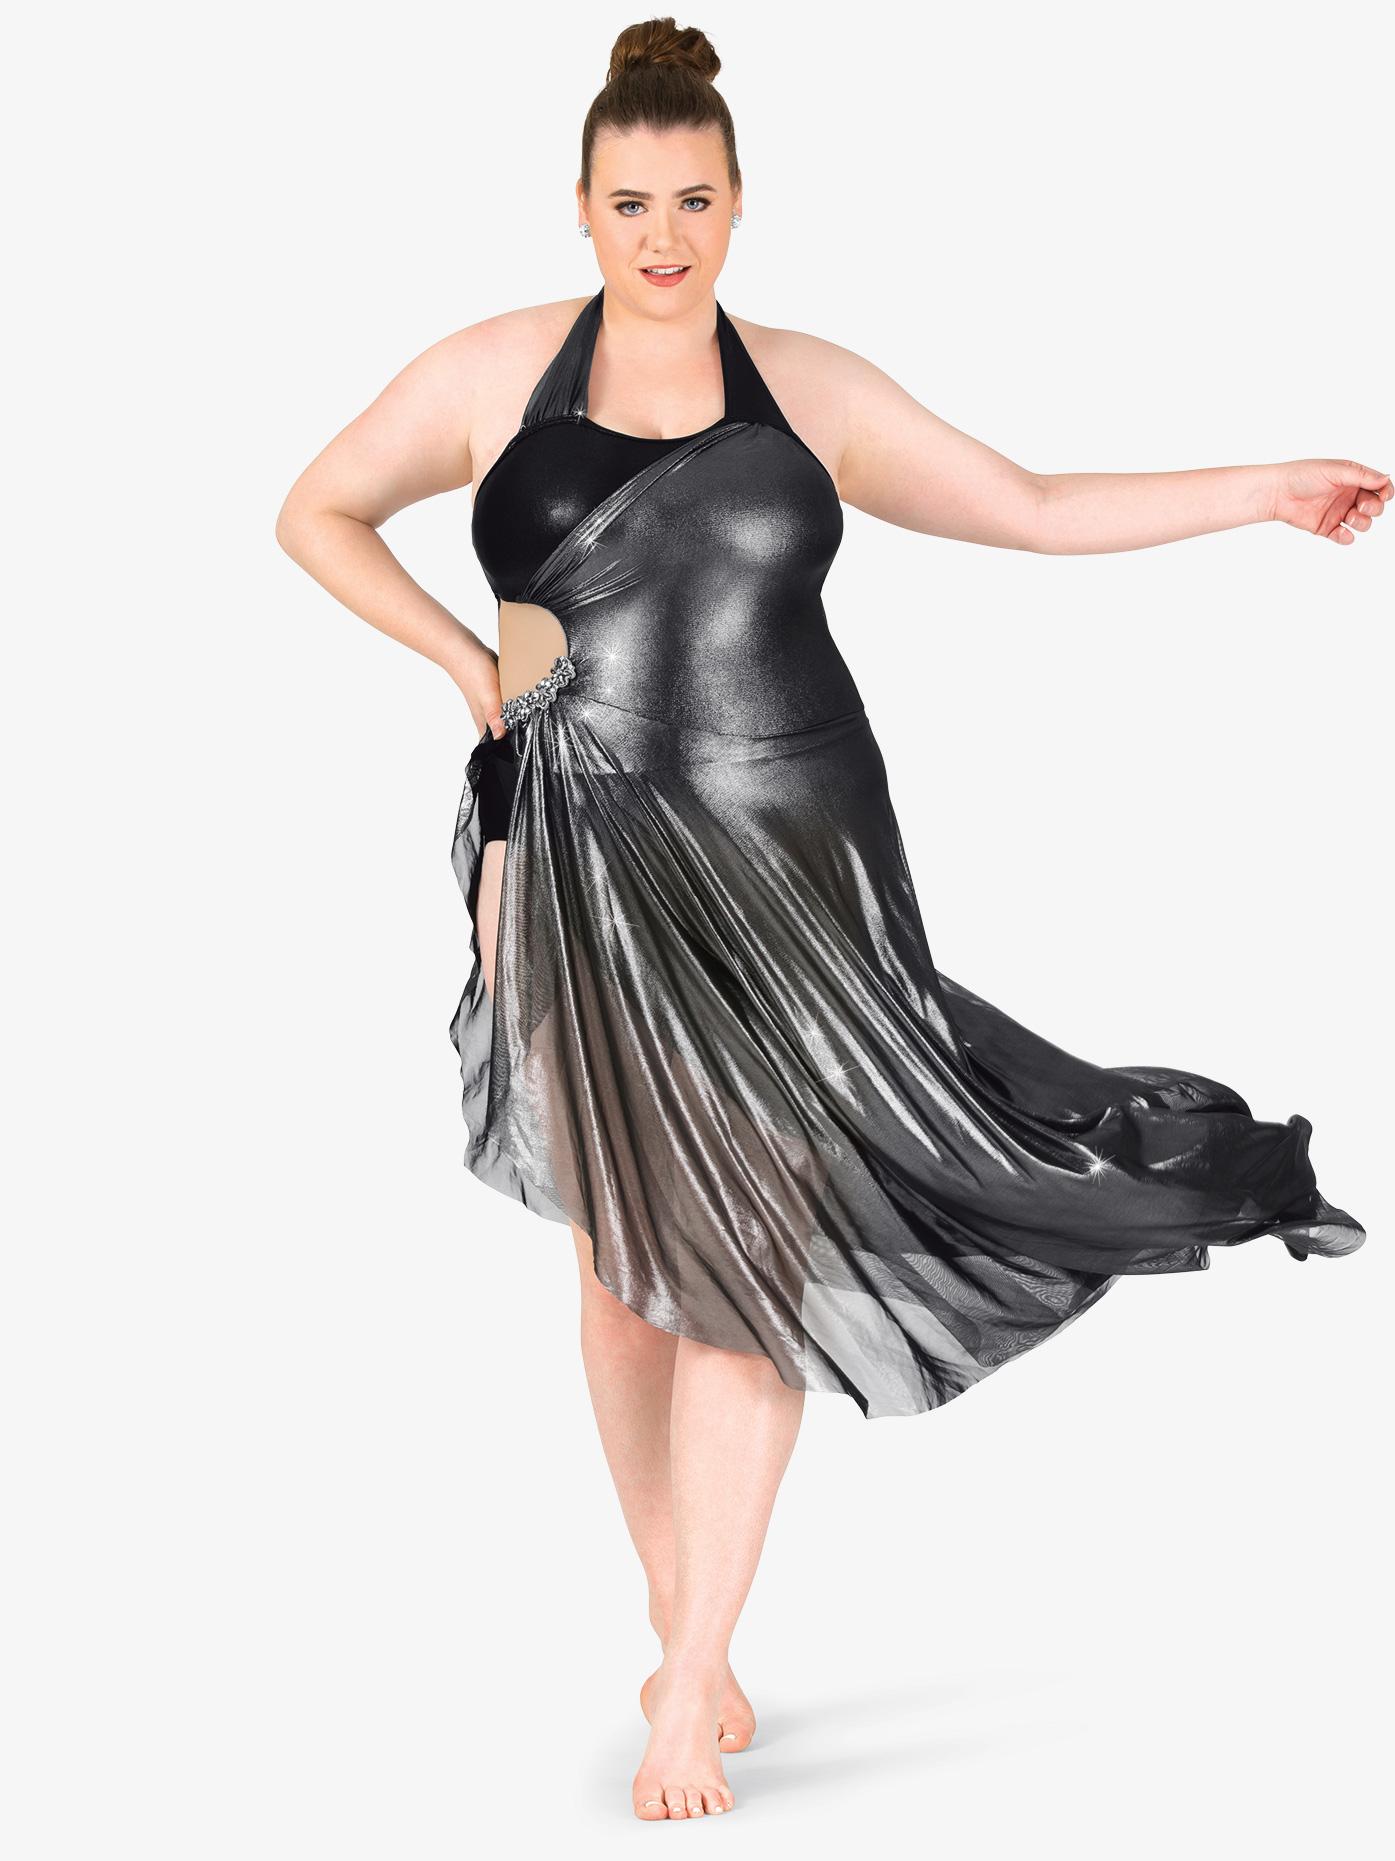 Elisse by Double Platinum Womens Plus Size Metallic Asymmetrical Halter Performance Dress N7477P